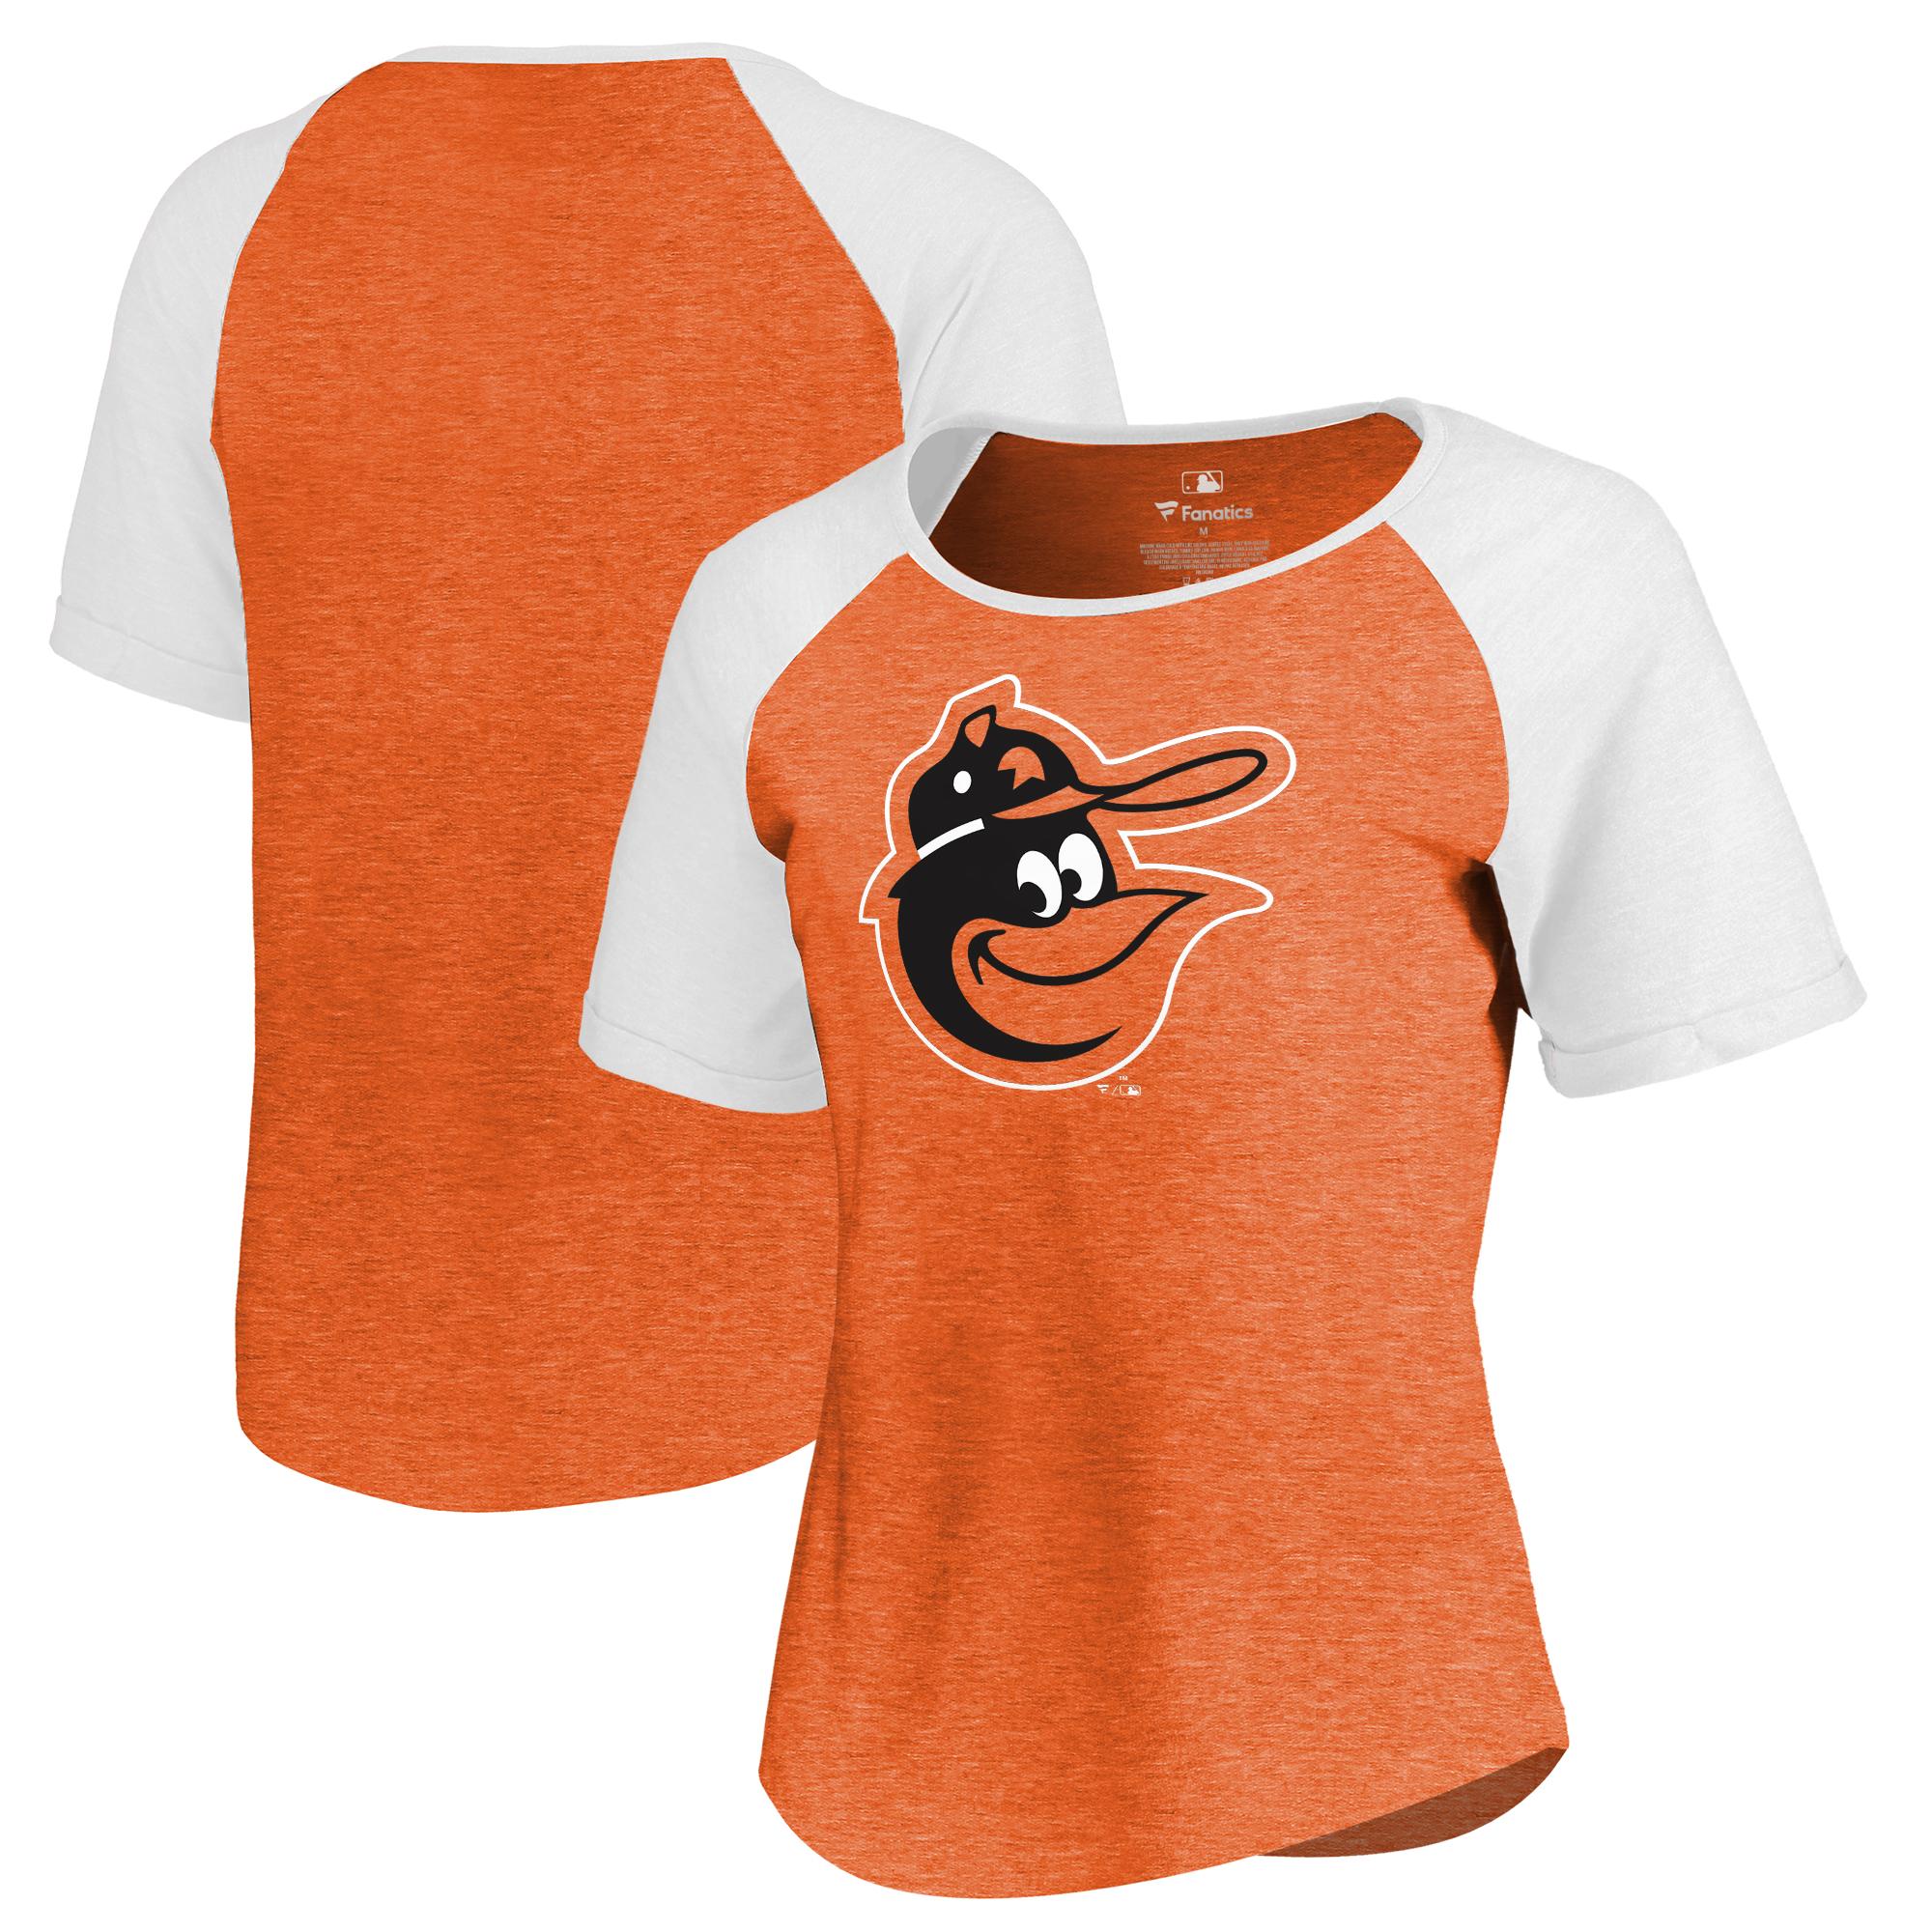 Baltimore Orioles Fanatics Branded Women's Huntington Cooperstown Collection Tri-Blend T-Shirt - Orange